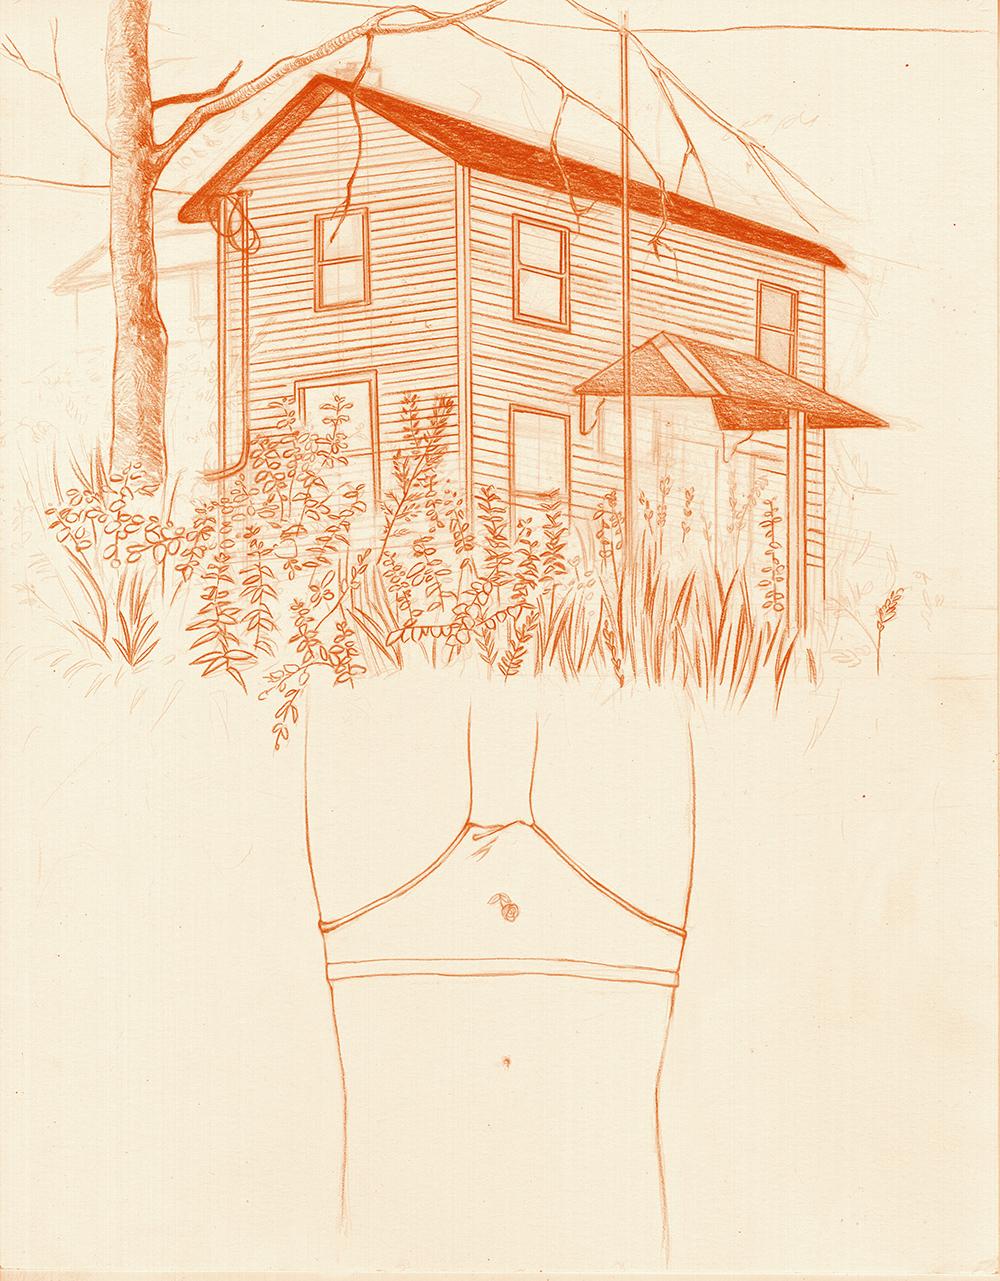 Chang Drawing1000pxl.jpg